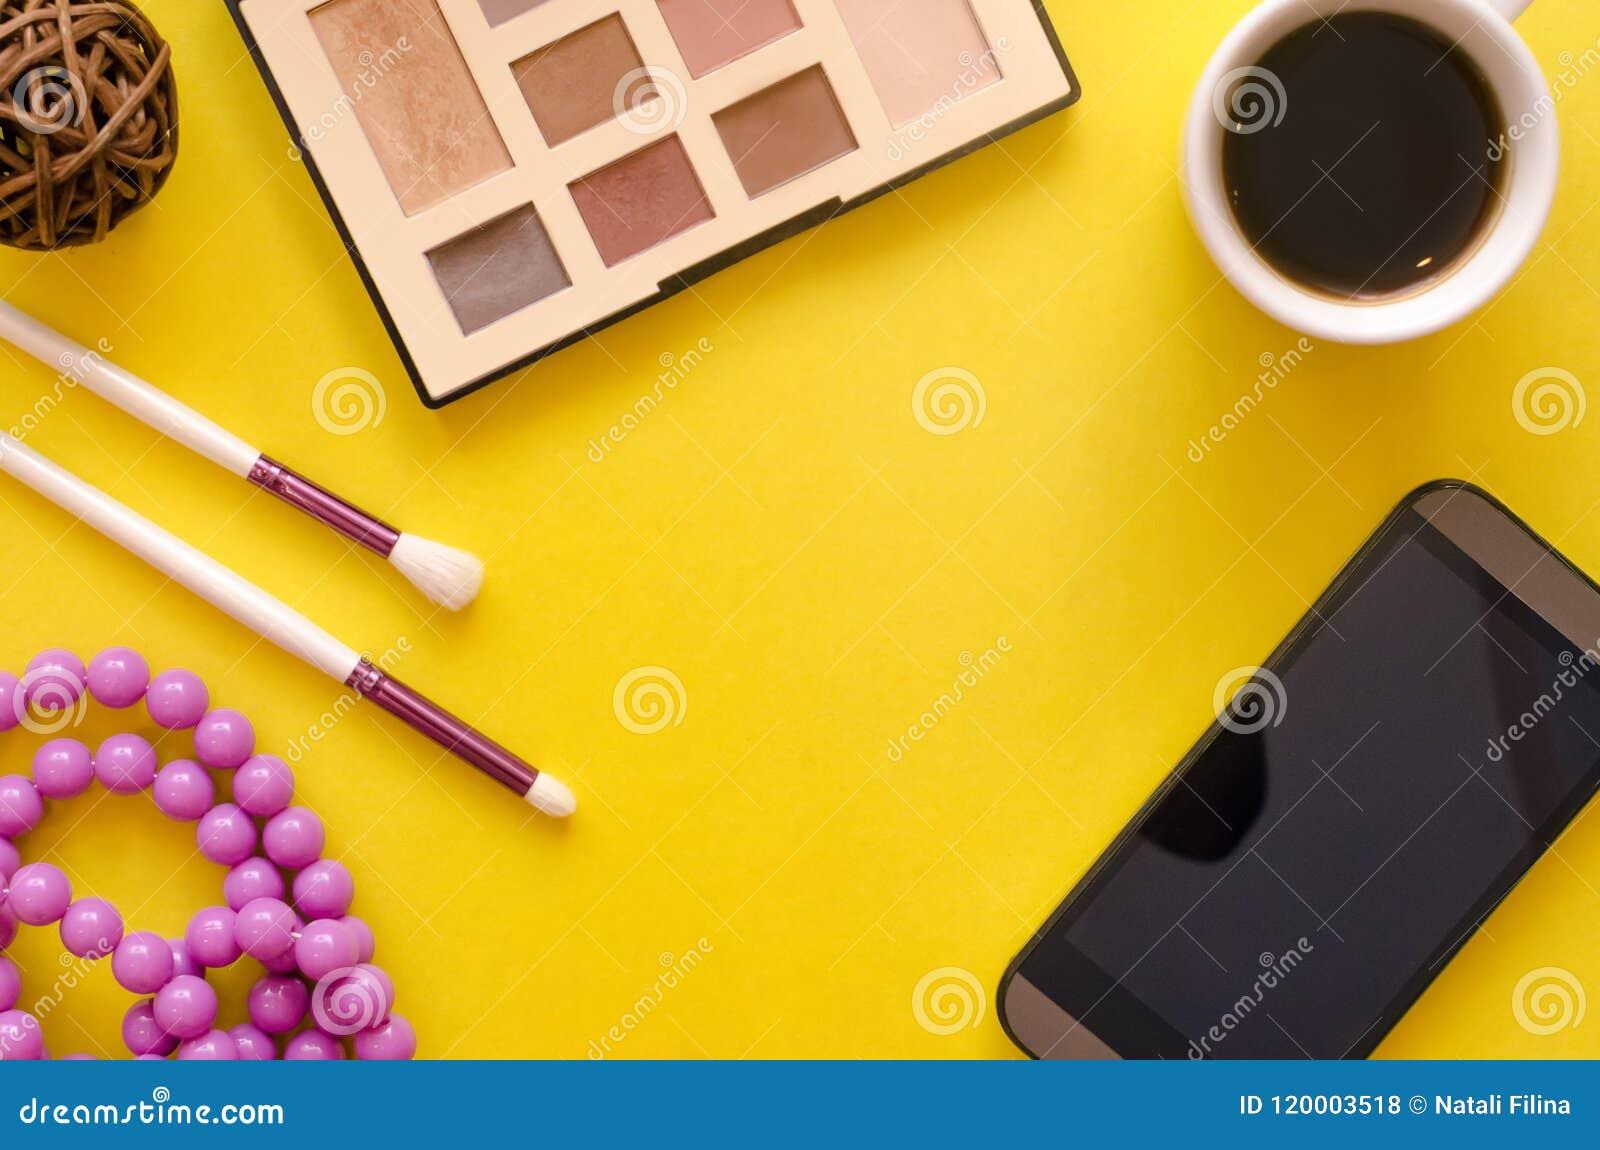 Make up beauty and fashion background.